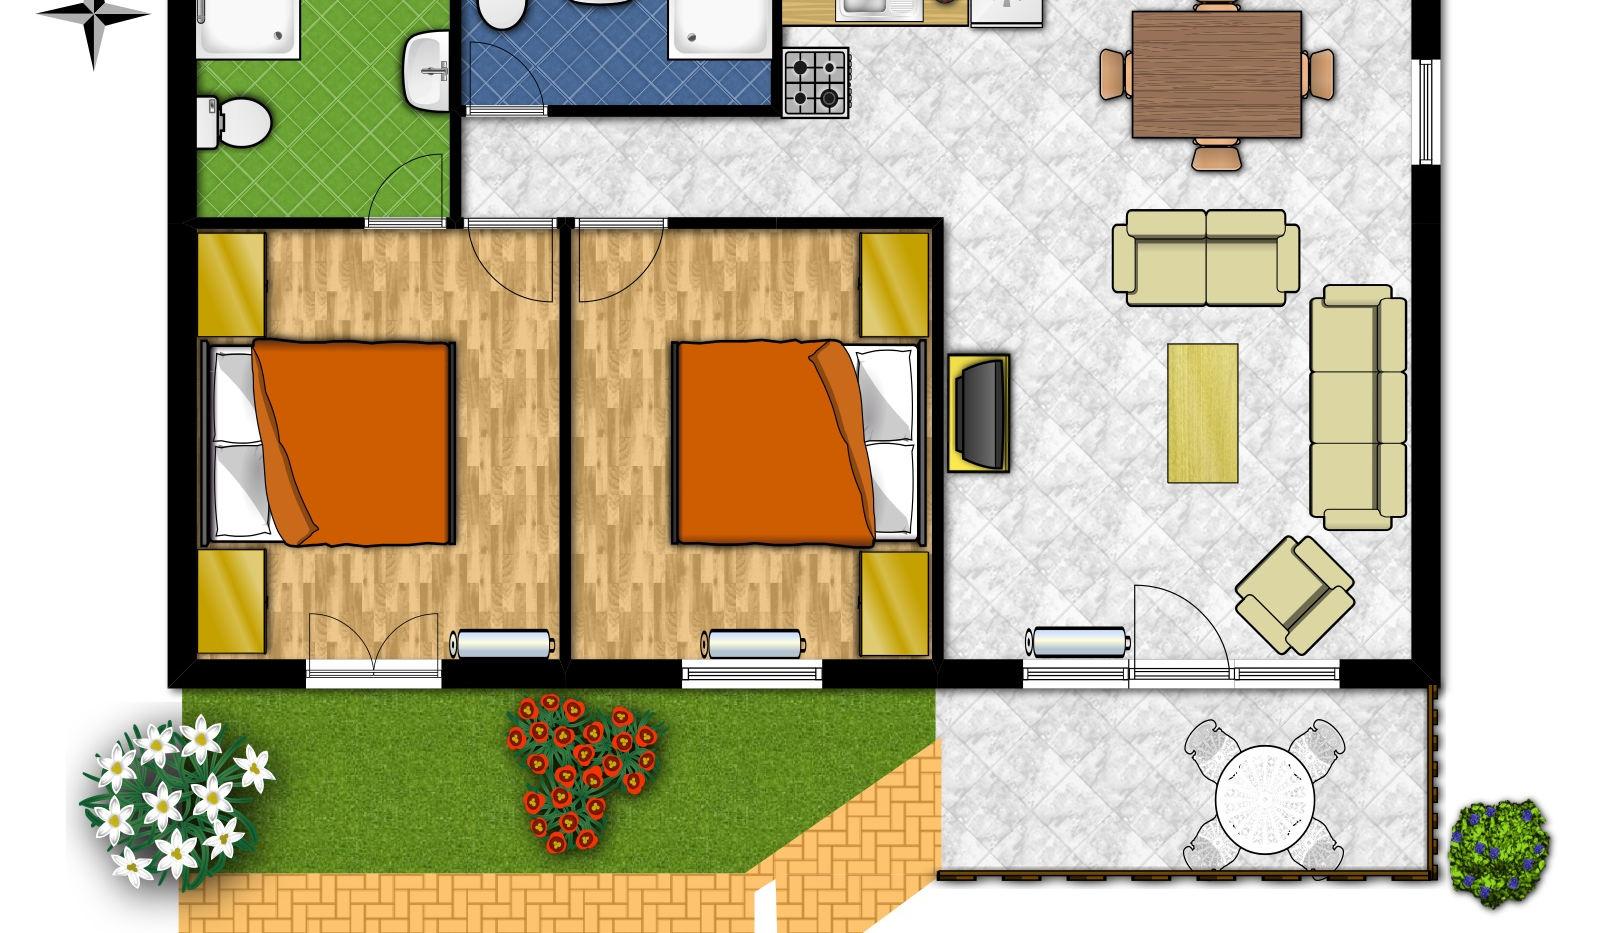 Zalakaros_House3_App4